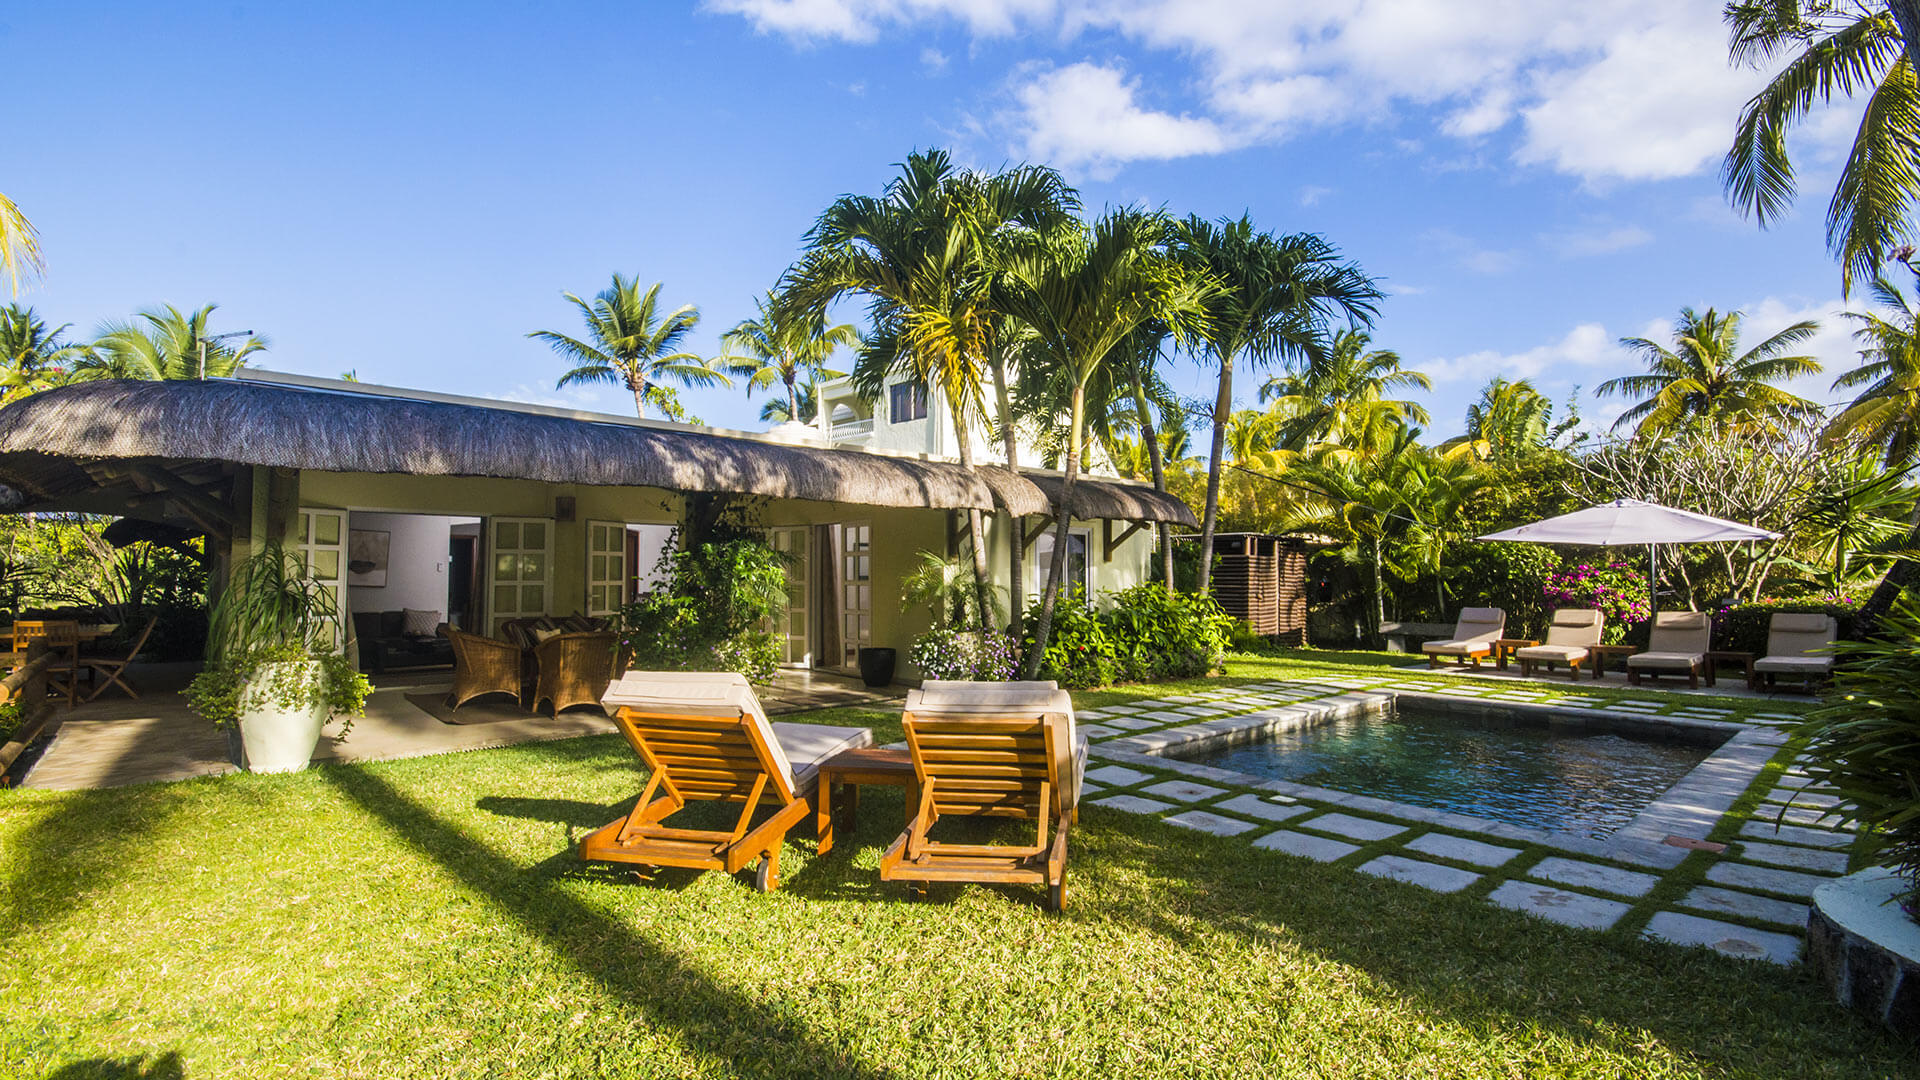 Villa Villa Sweet Badamier, Rental in Mauritius East